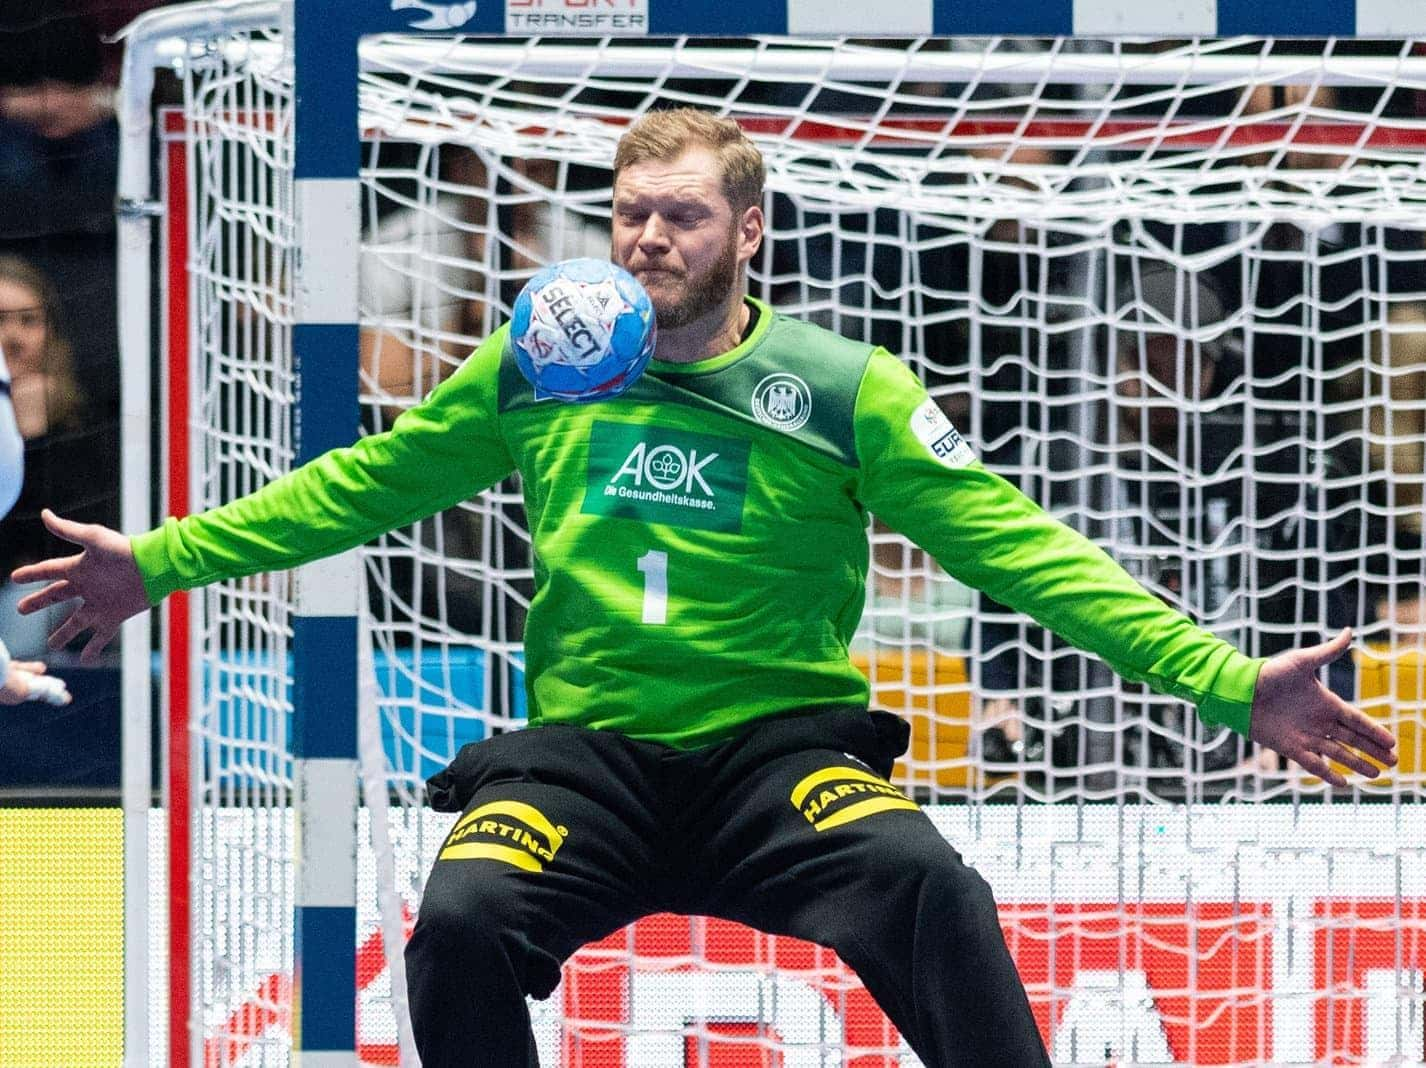 Handball Em 2021 Gruppen